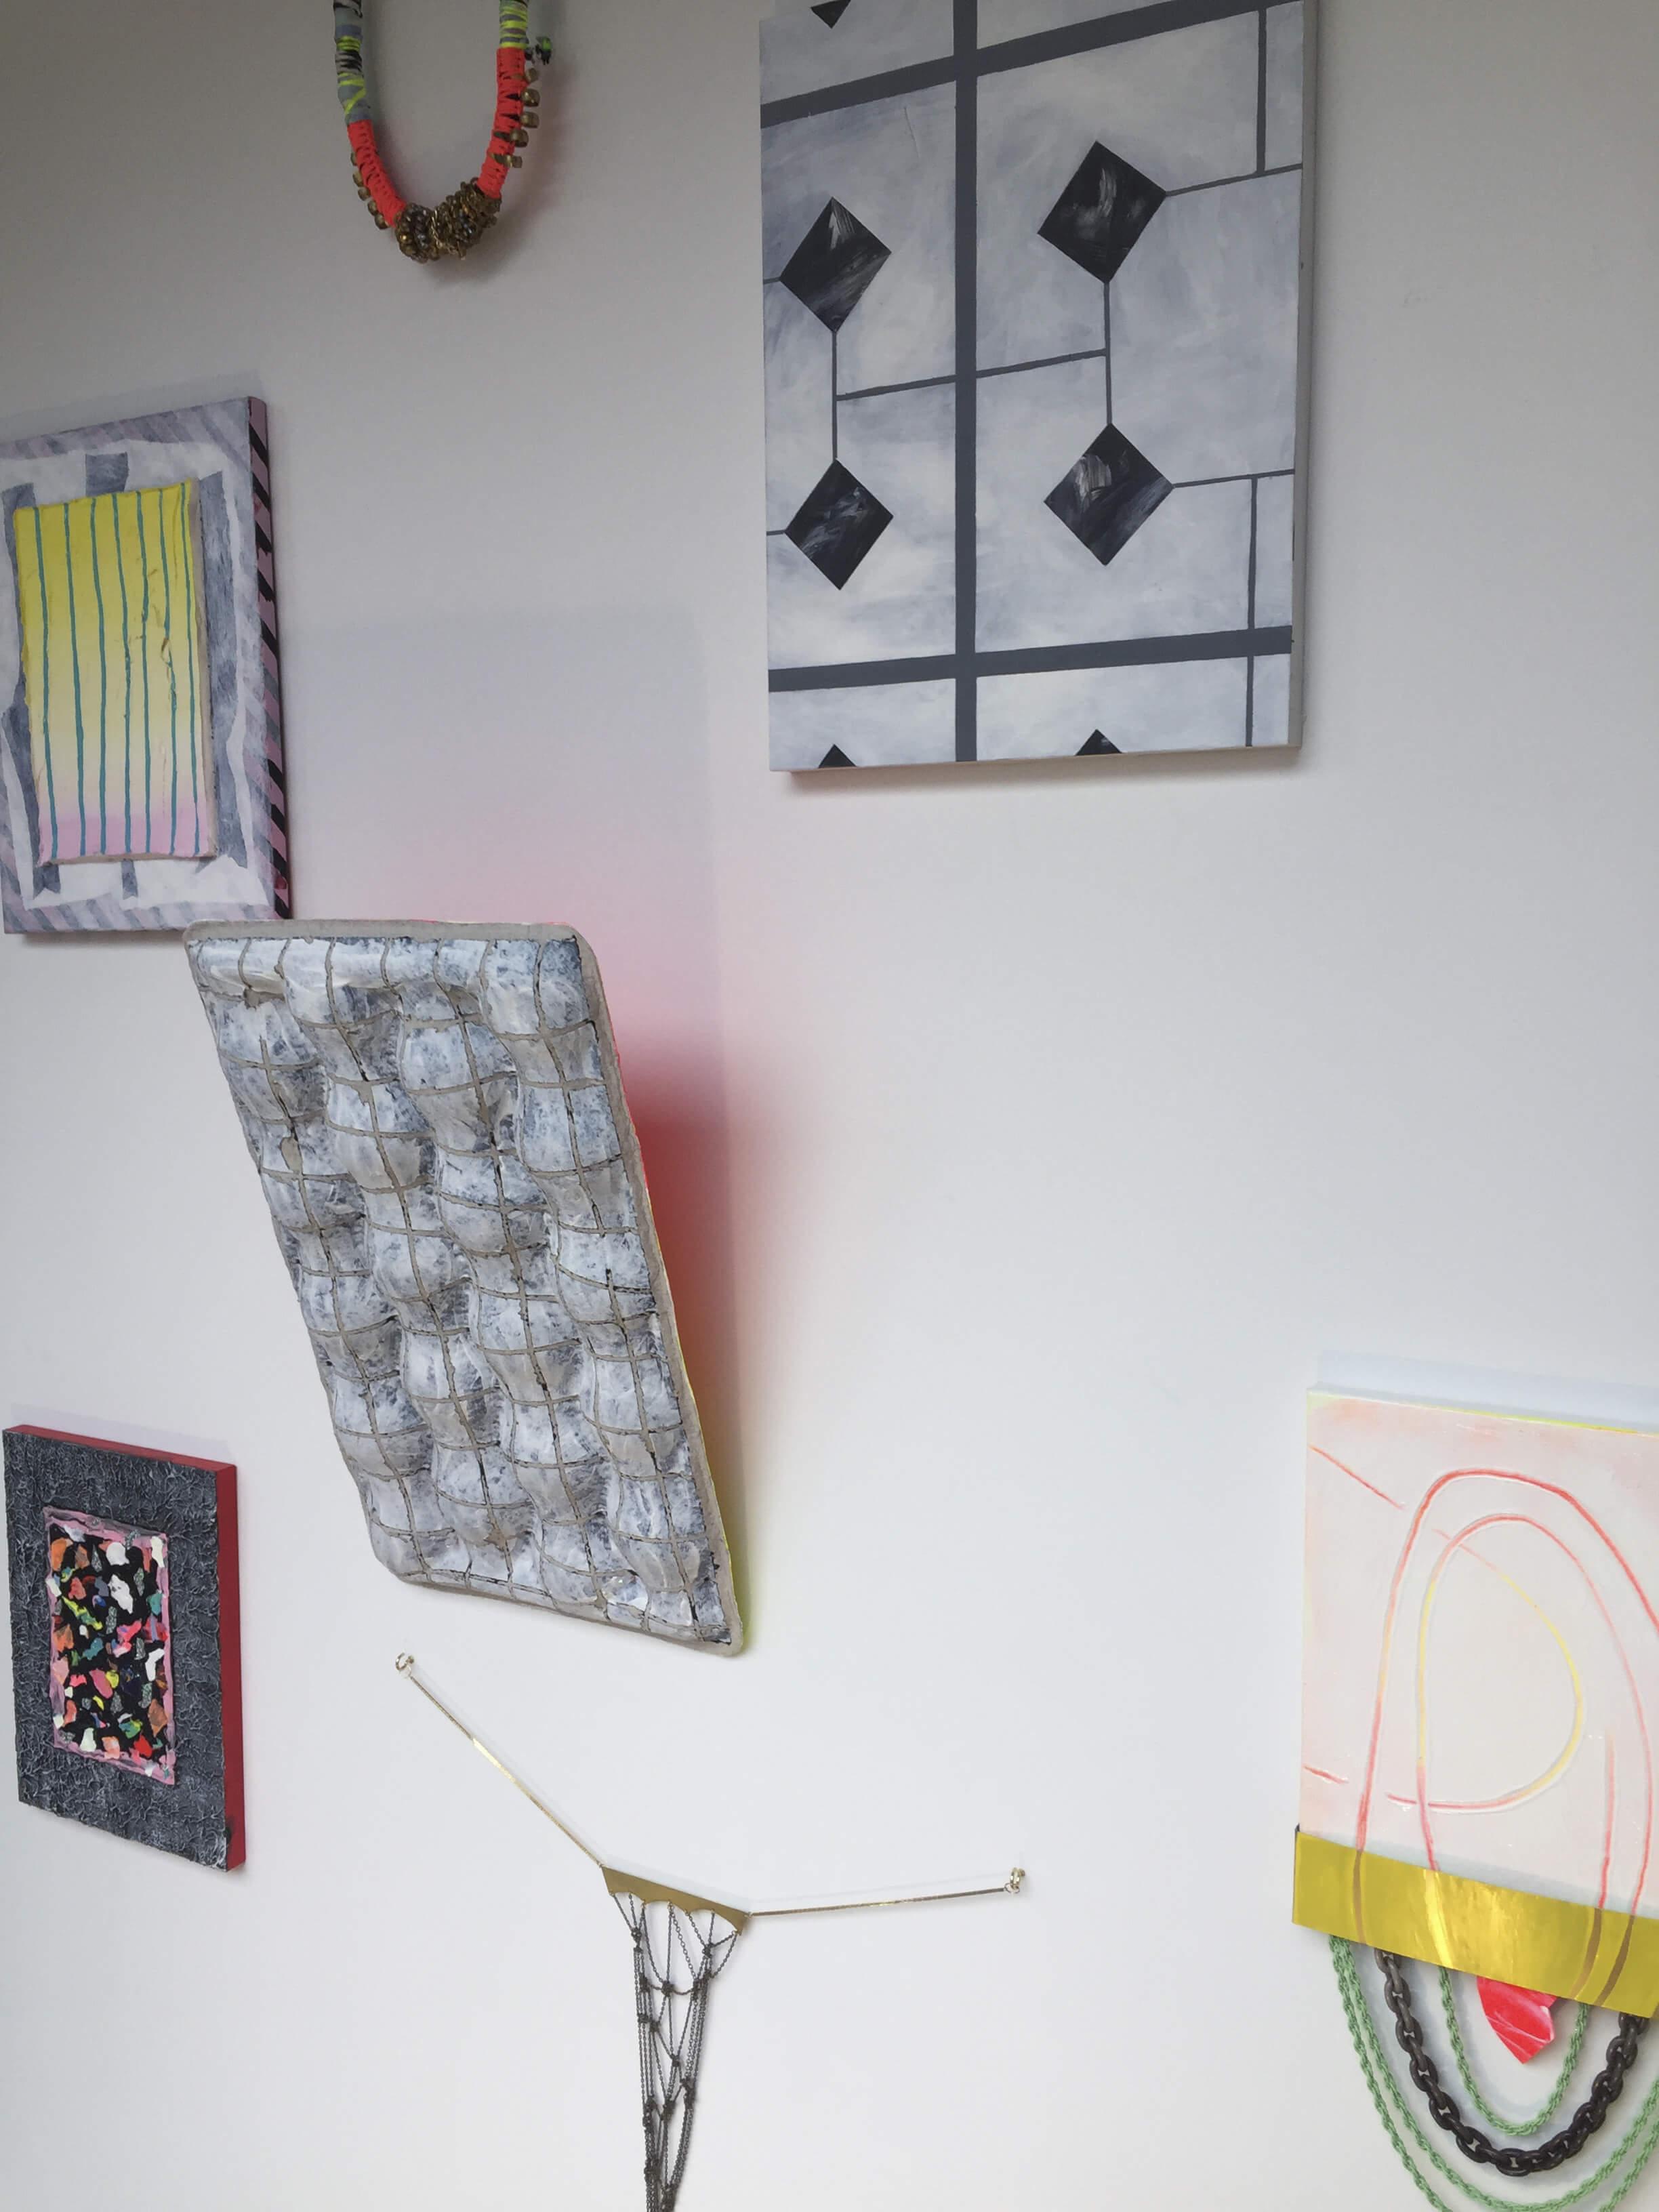 nmn_instalation-view-Unisexsalon-Gallery_2017-01